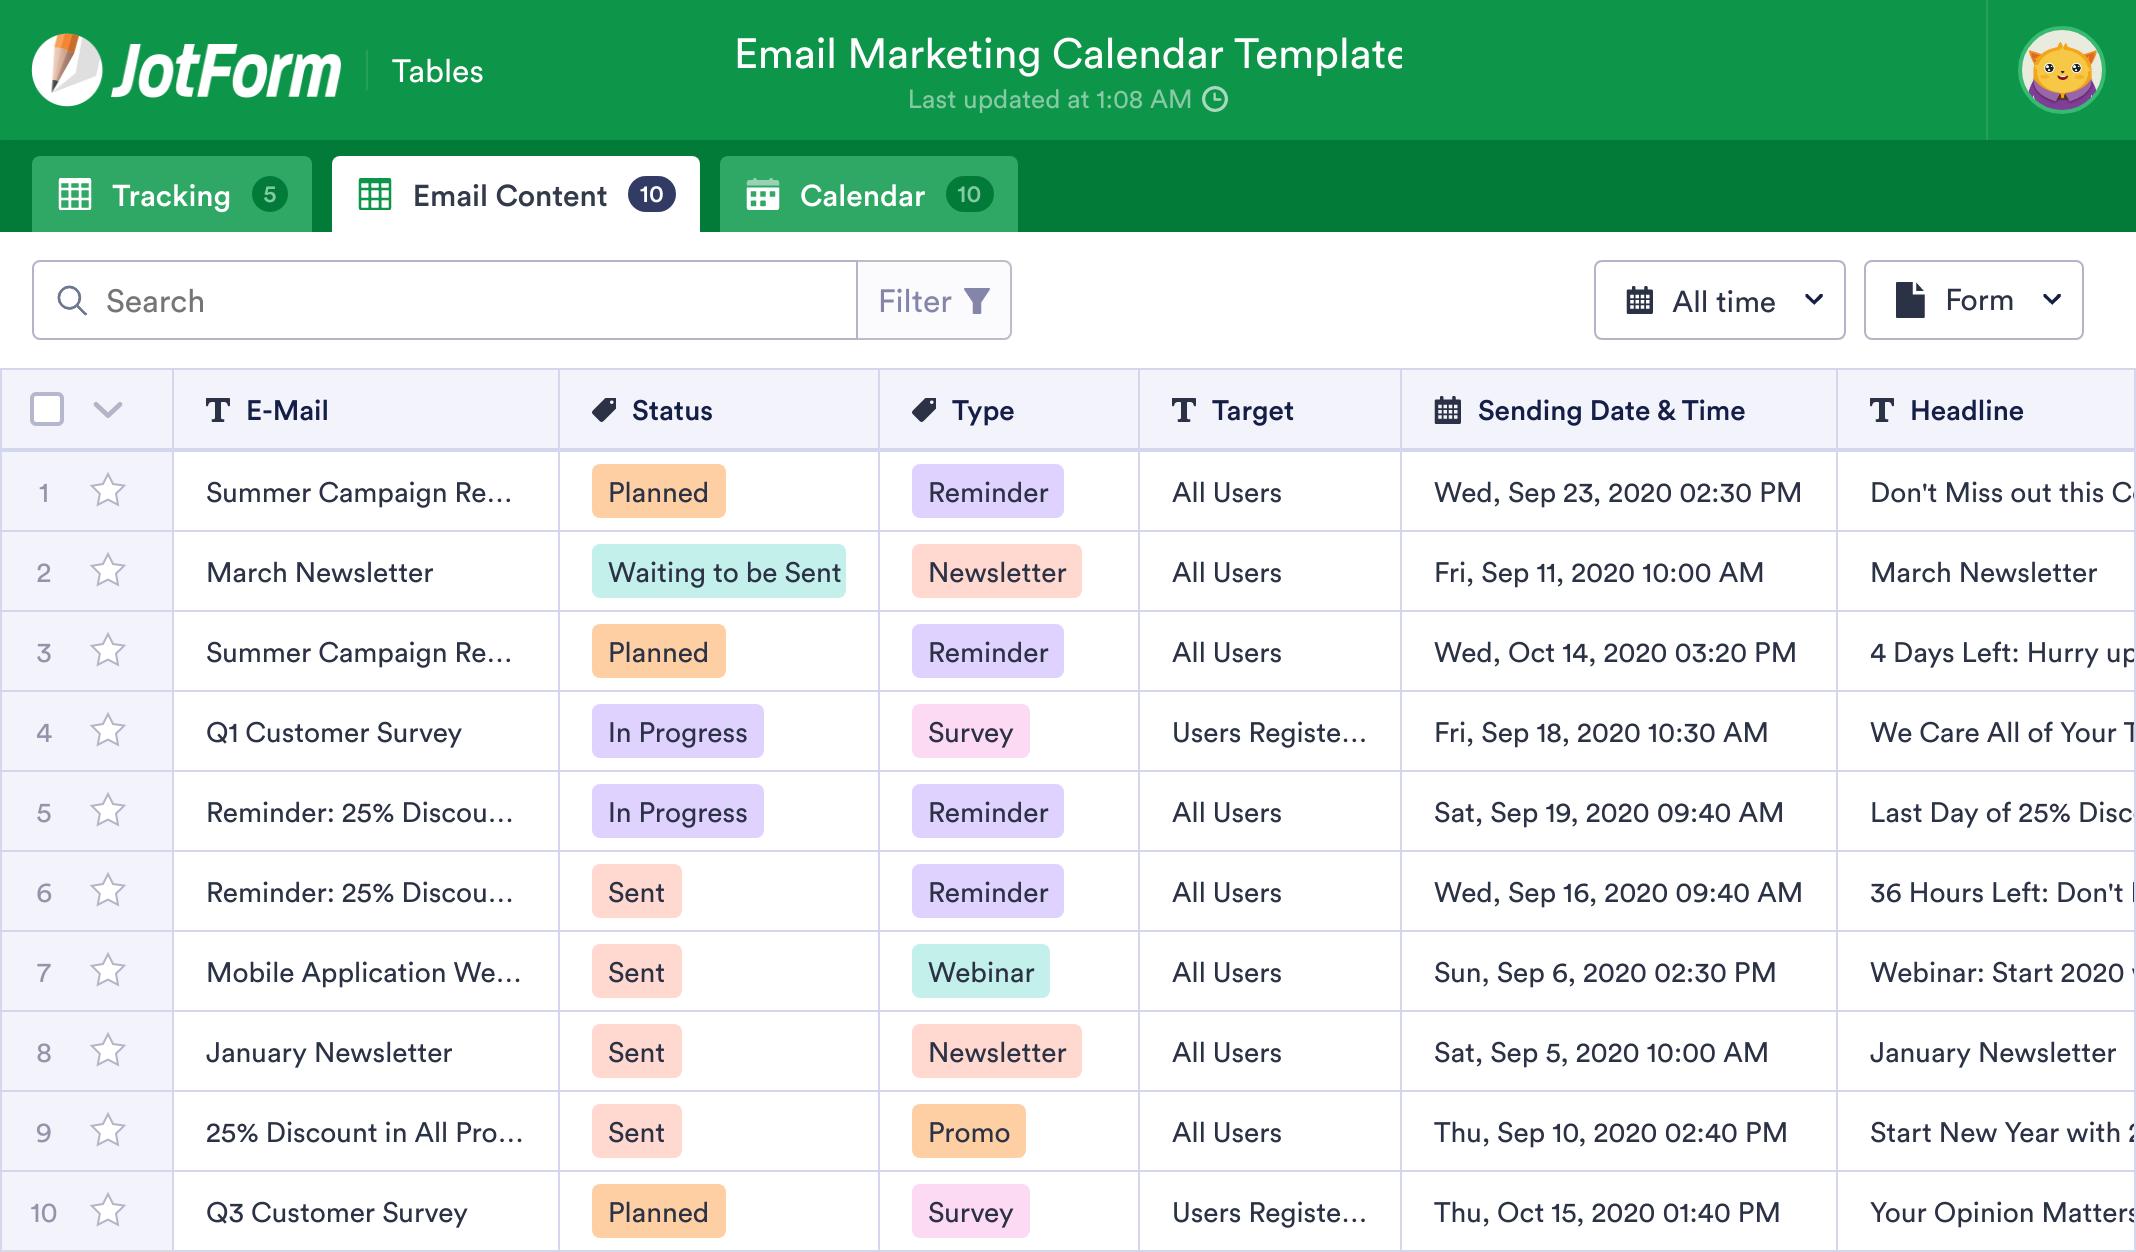 Email Marketing Calendar Template